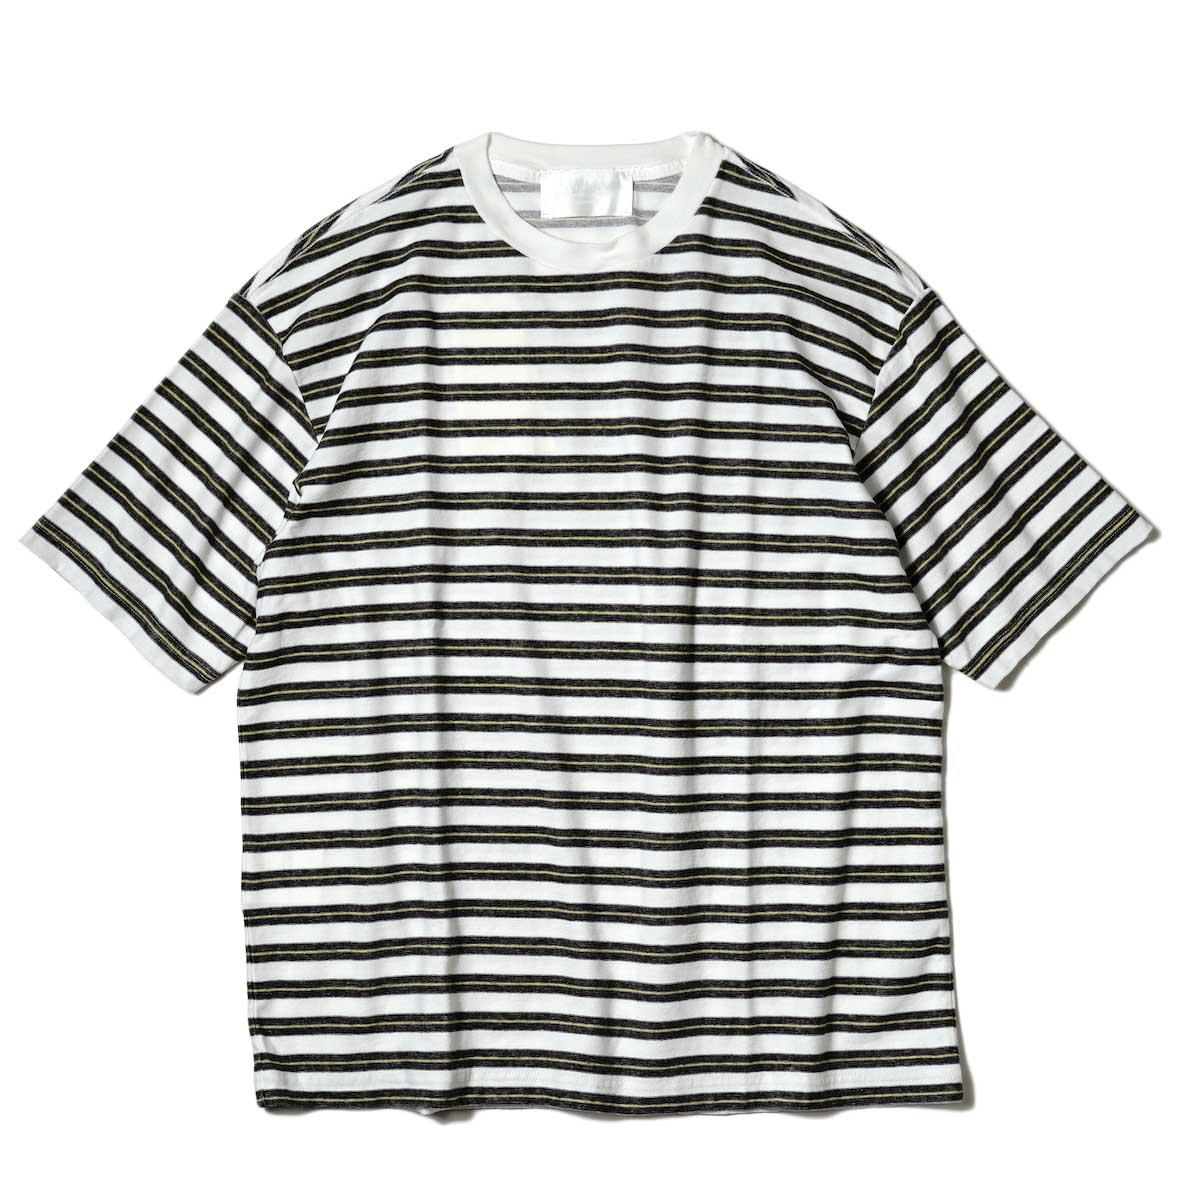 UNUSED / US2109 S/S Border Tee (White × Black) 正面